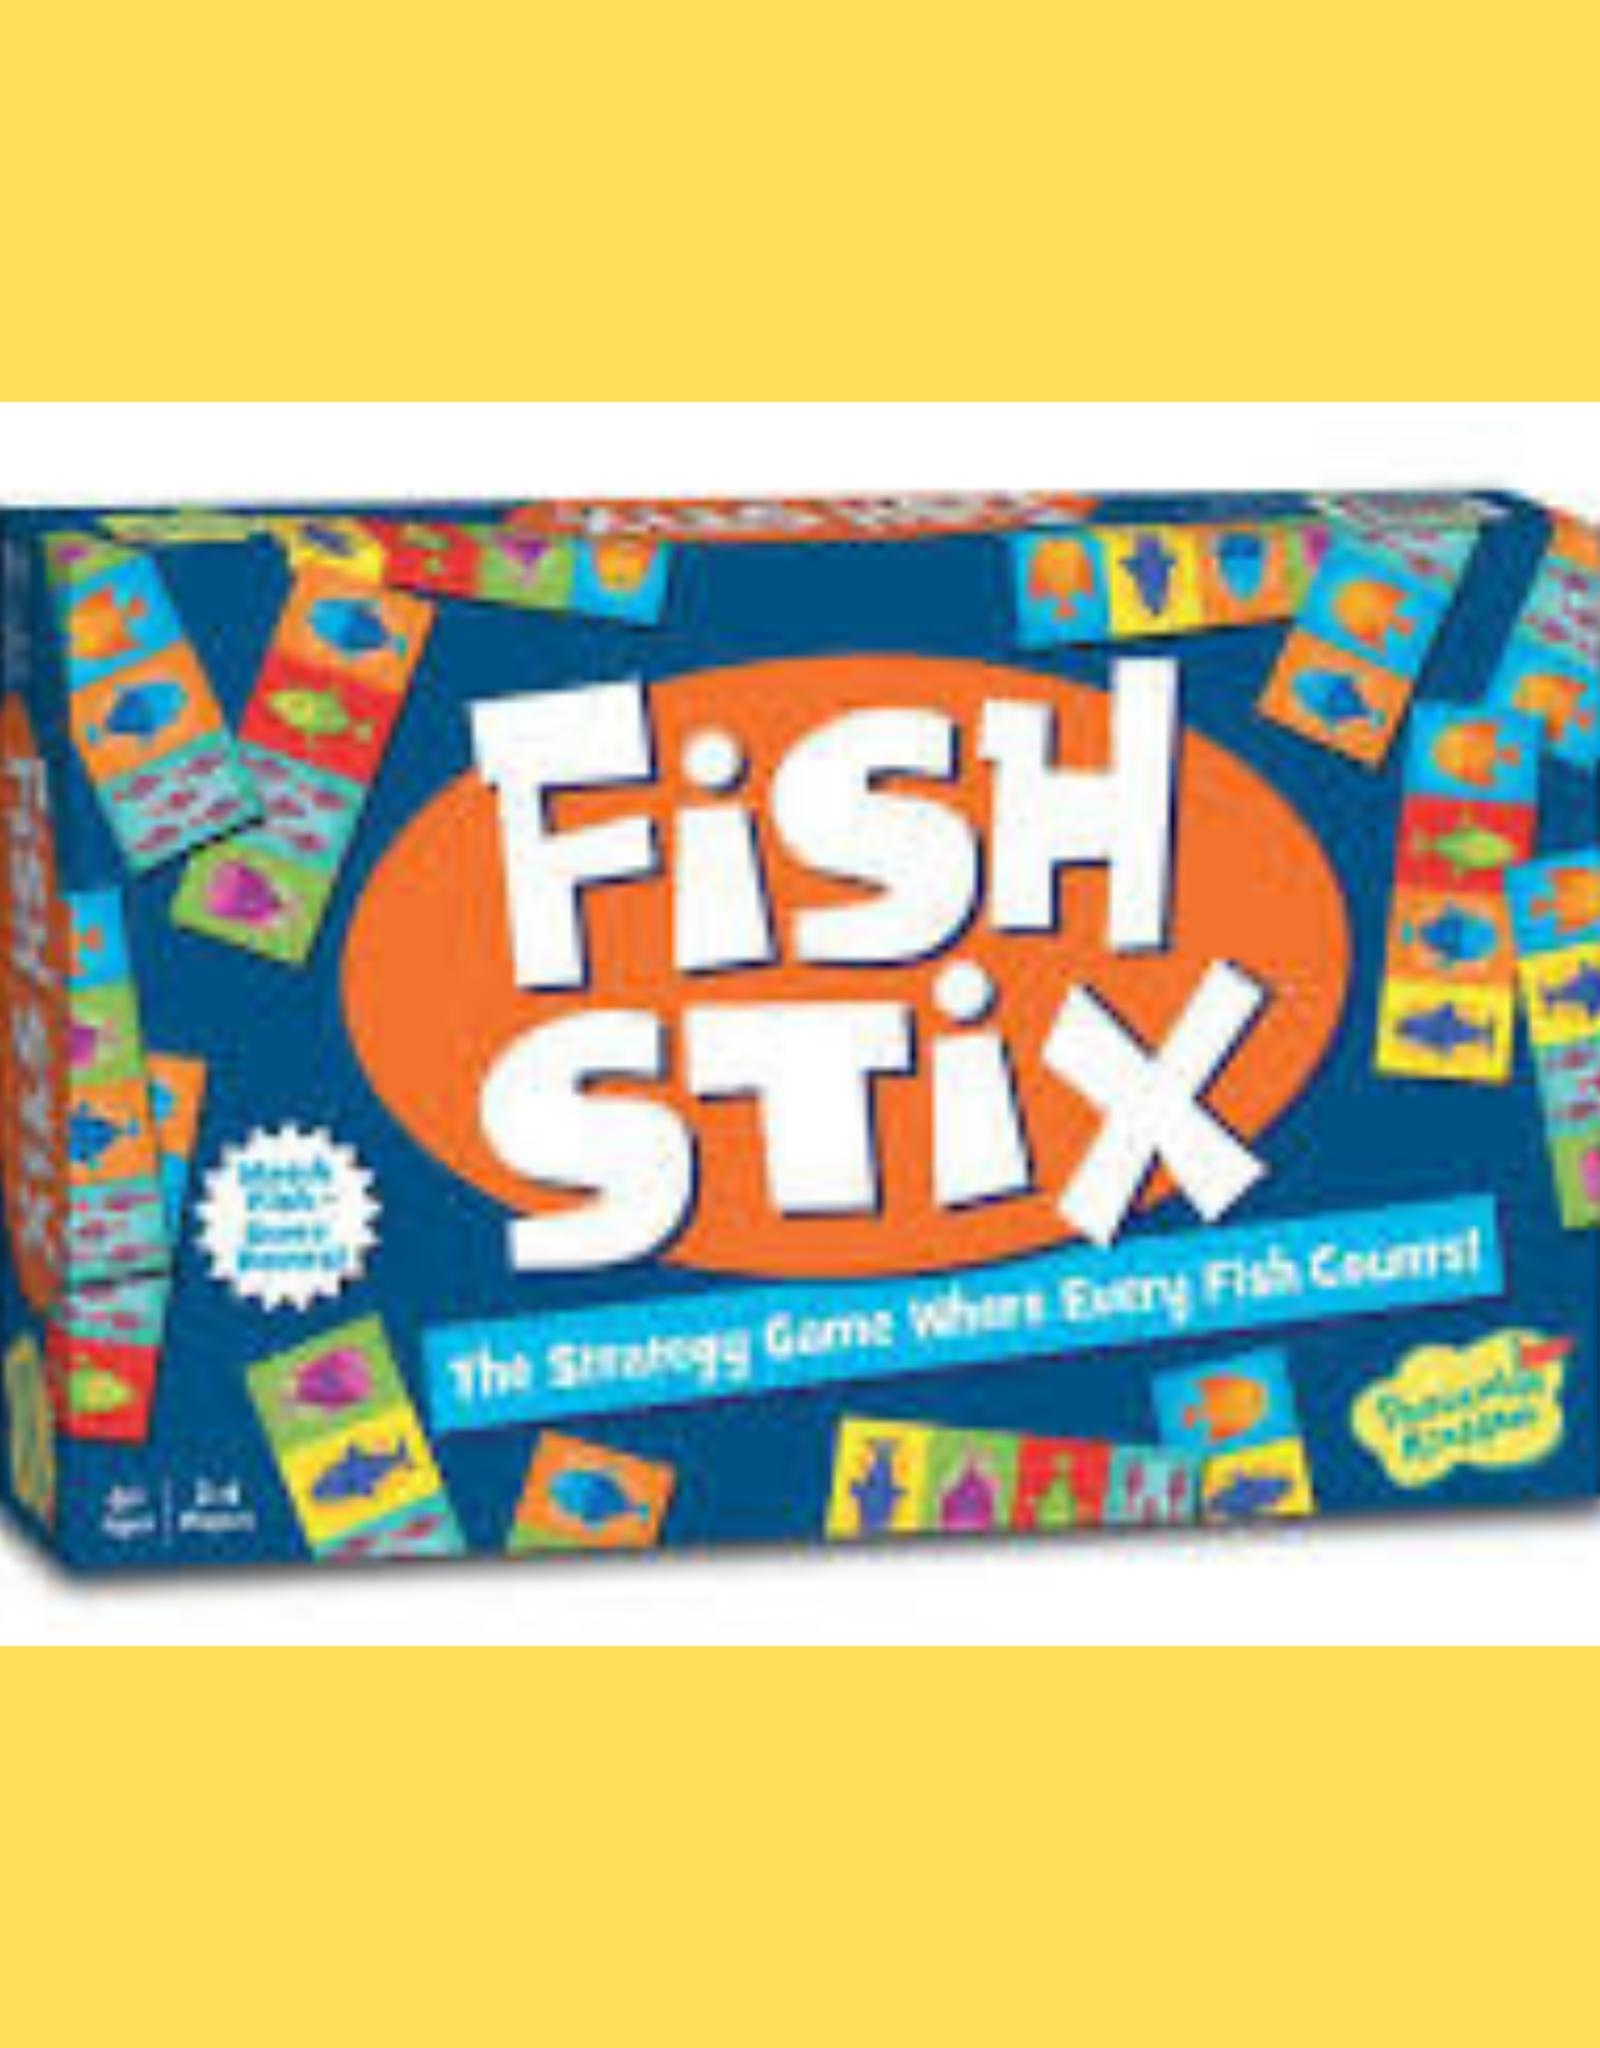 PEACEABLE KINGDOM MINDWARE FISH STIX GAME